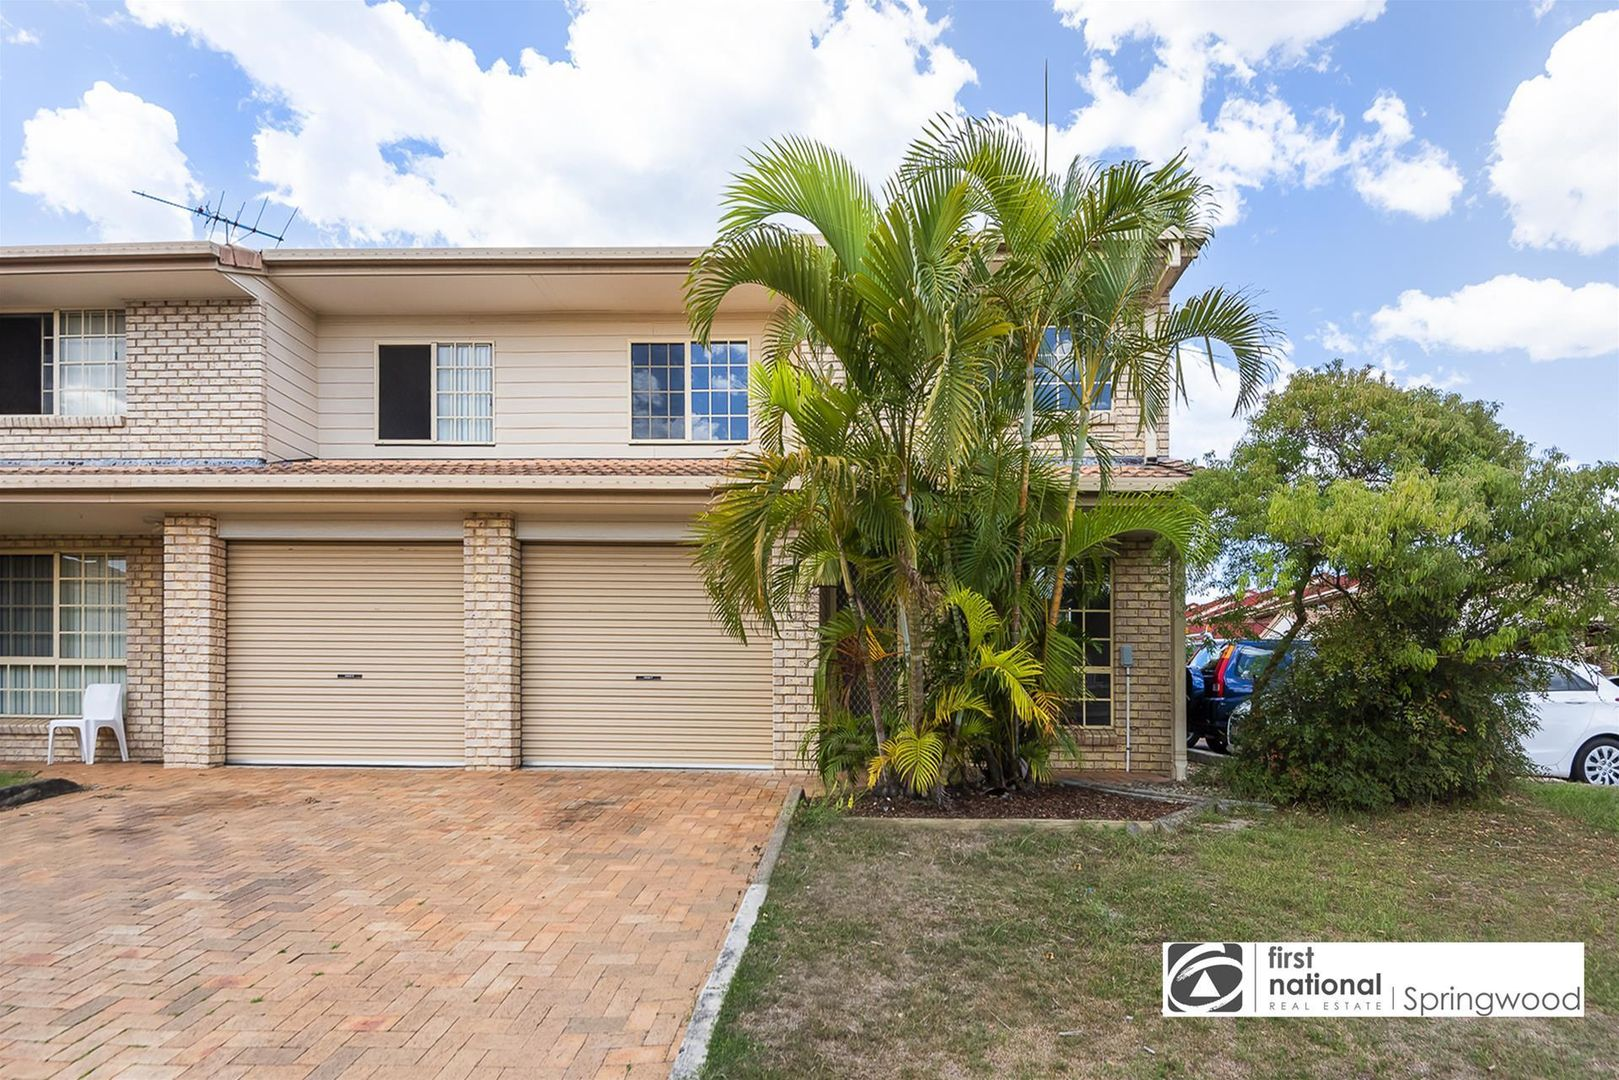 68/99 Barbaralla Drive, Springwood QLD 4127, Image 0